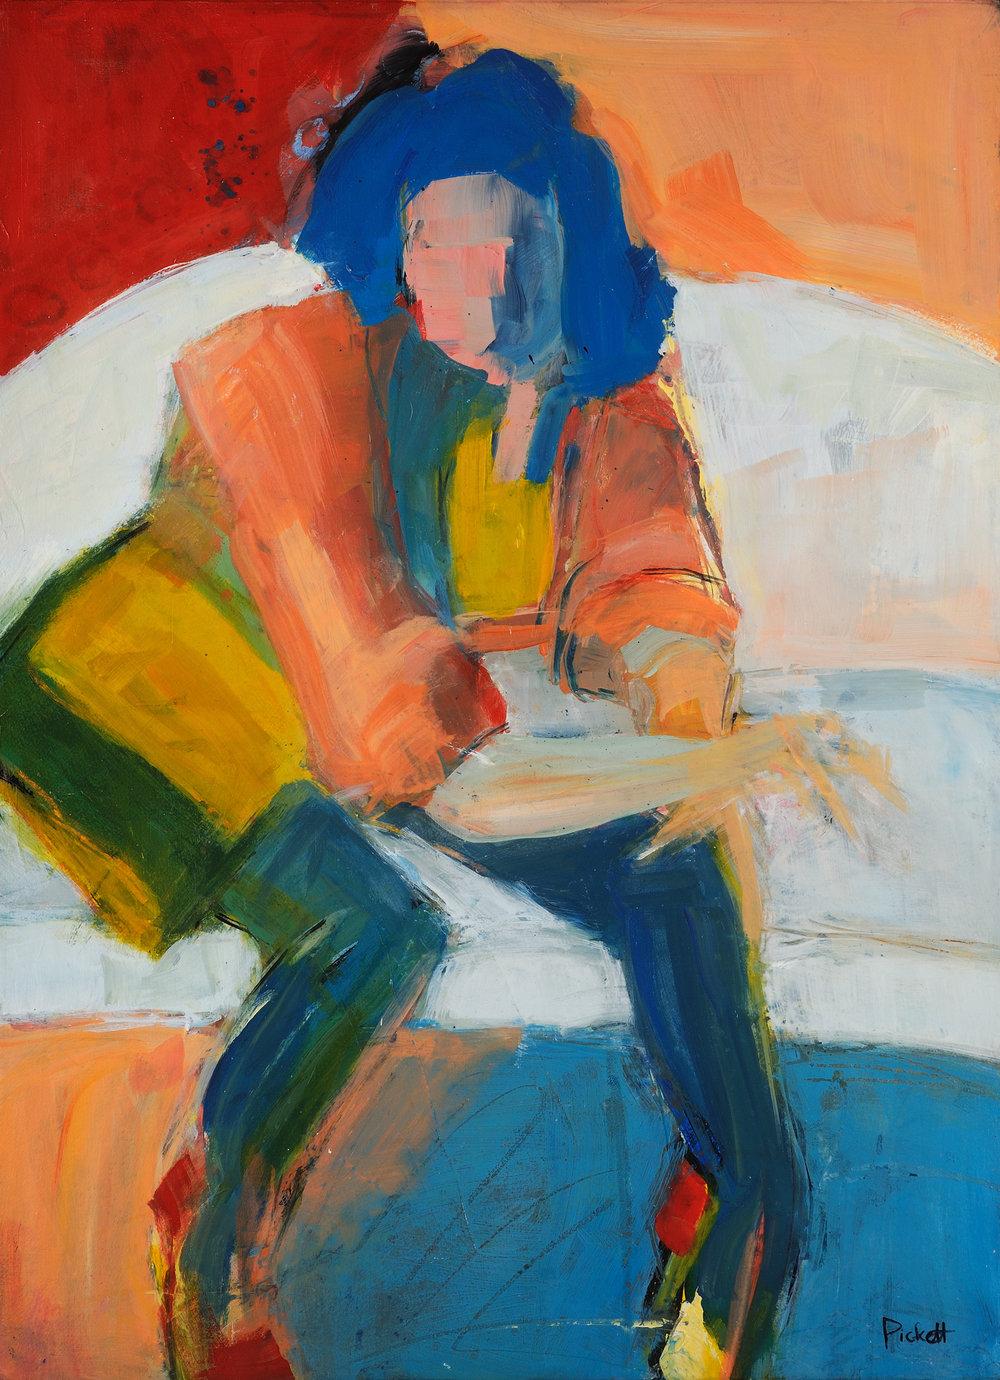 Foundry Gallery-Ann Pickett-Bee-30x22-Acrylic-2017-$1200.jpg